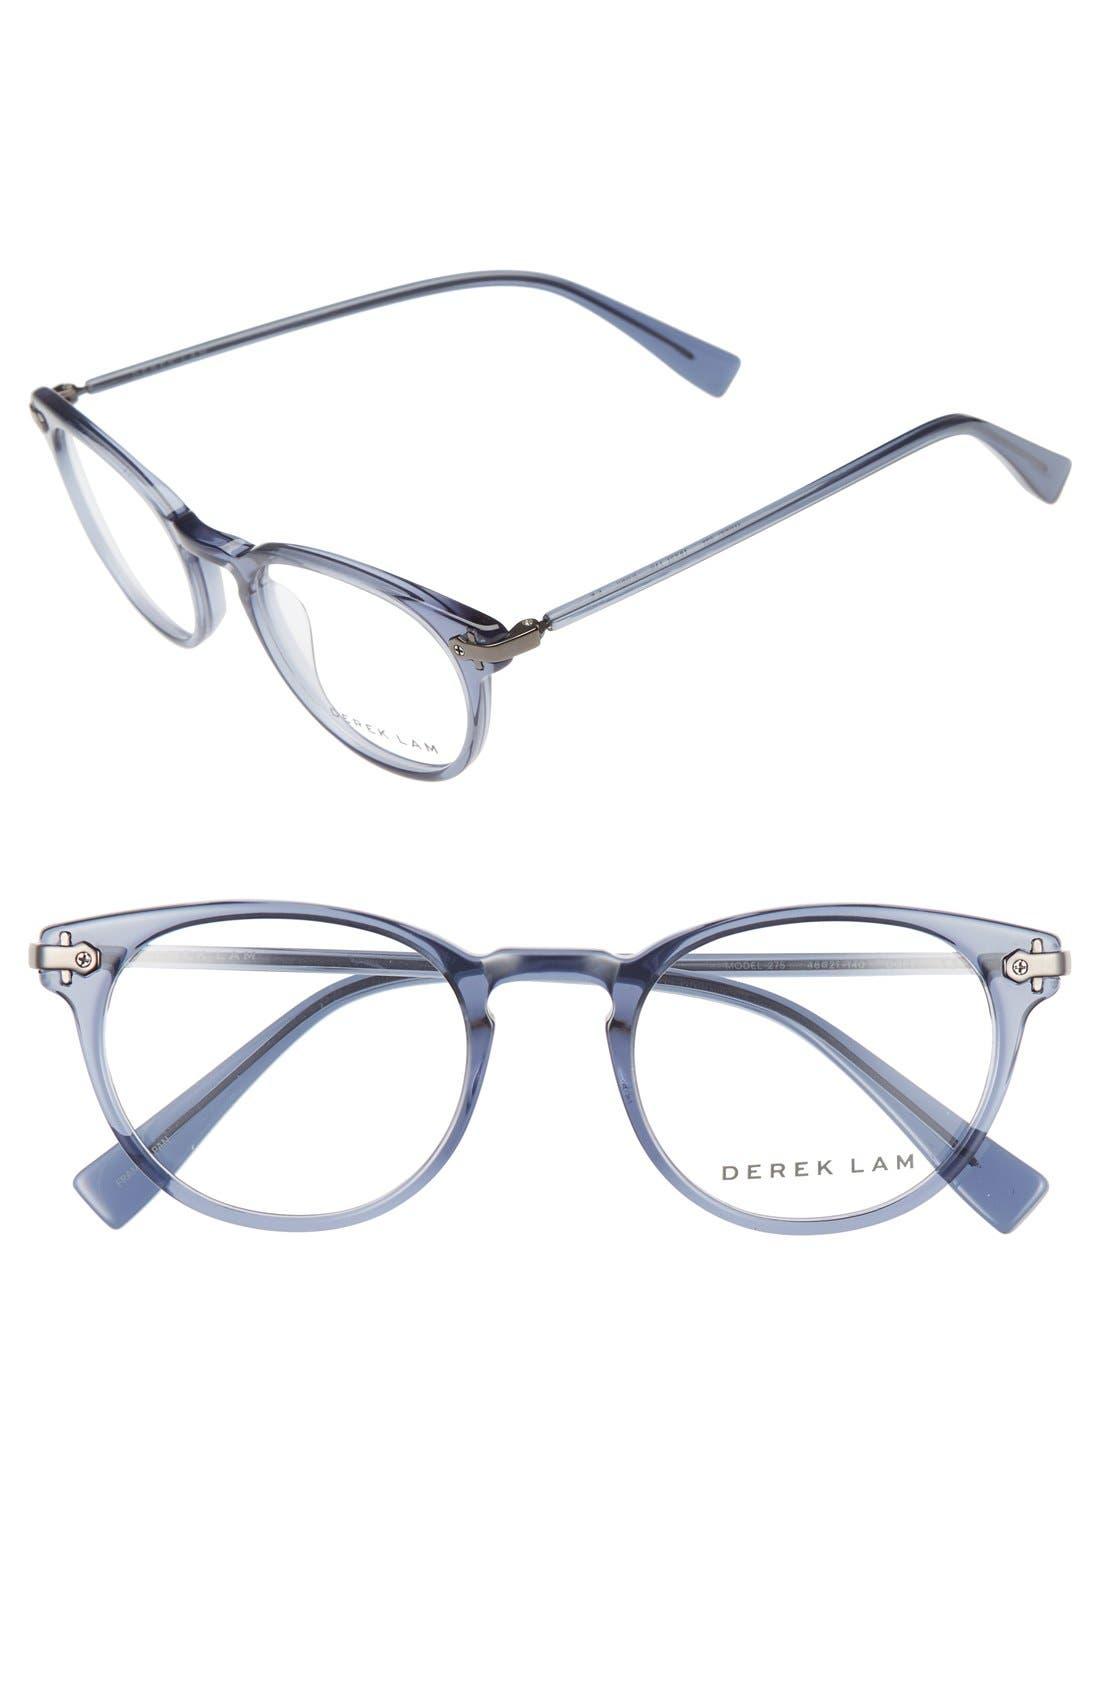 48mm Optical Glasses,                         Main,                         color, 020